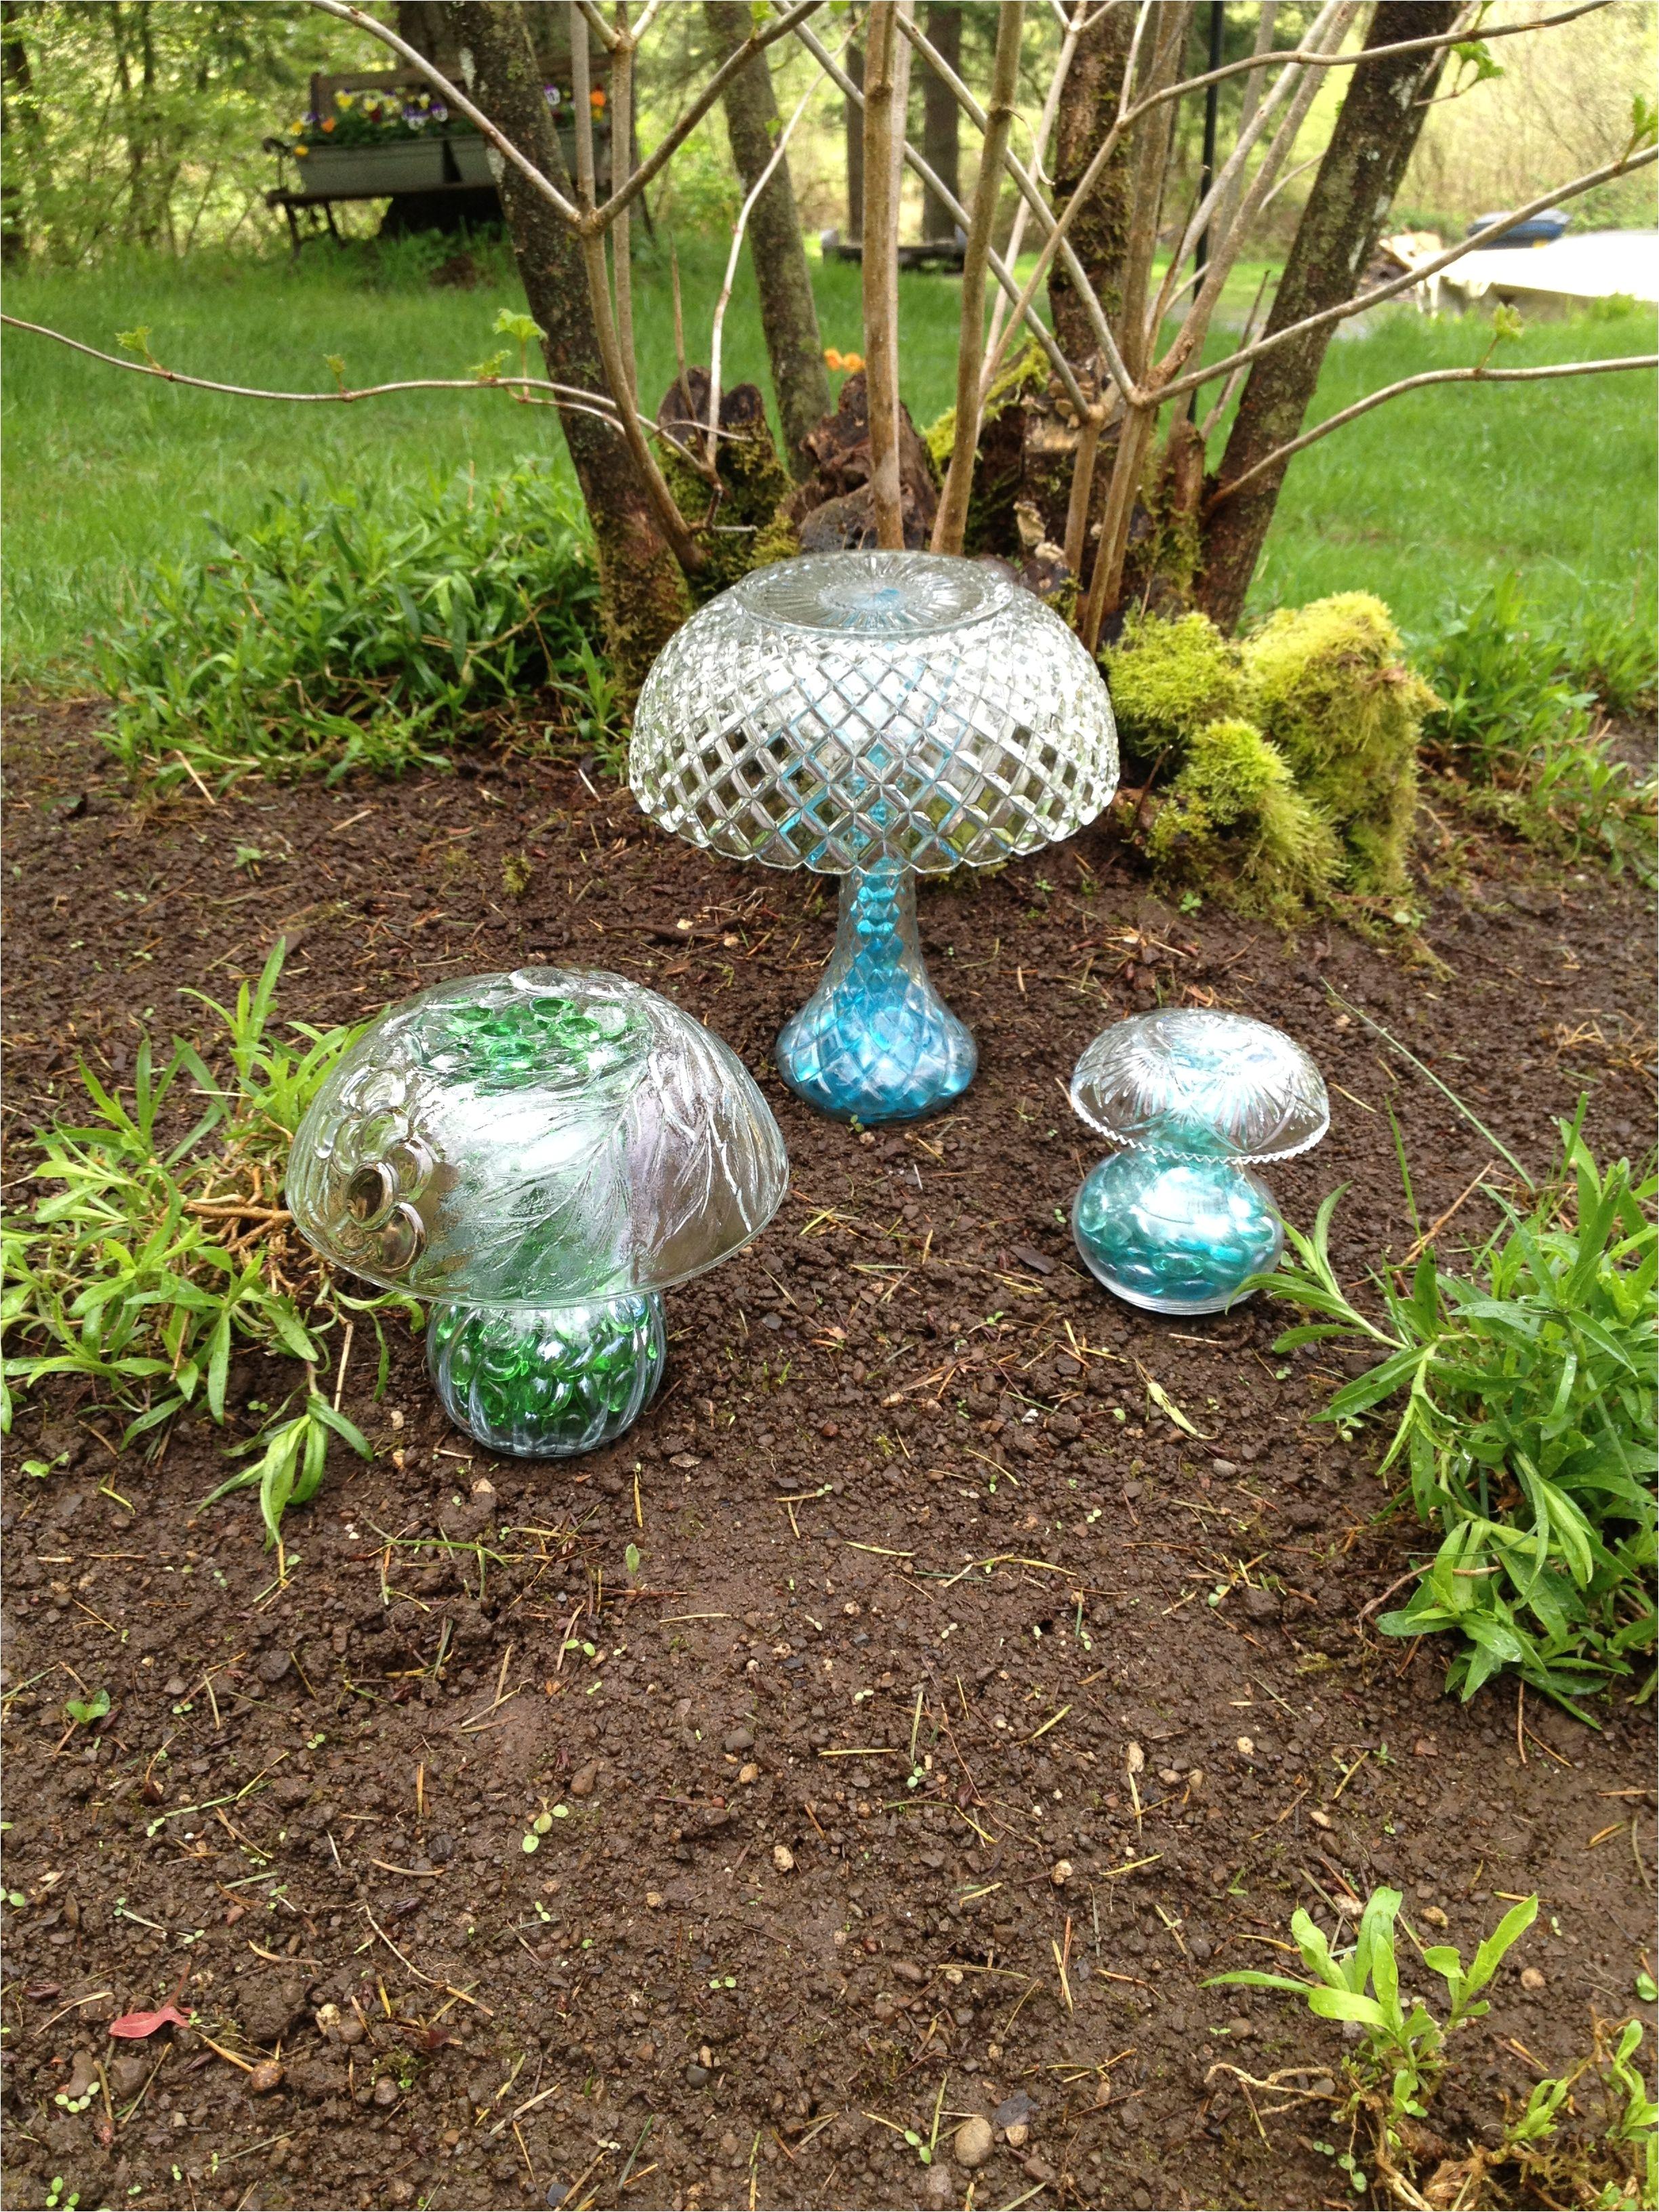 diy mushrooms lawn decor upcycle